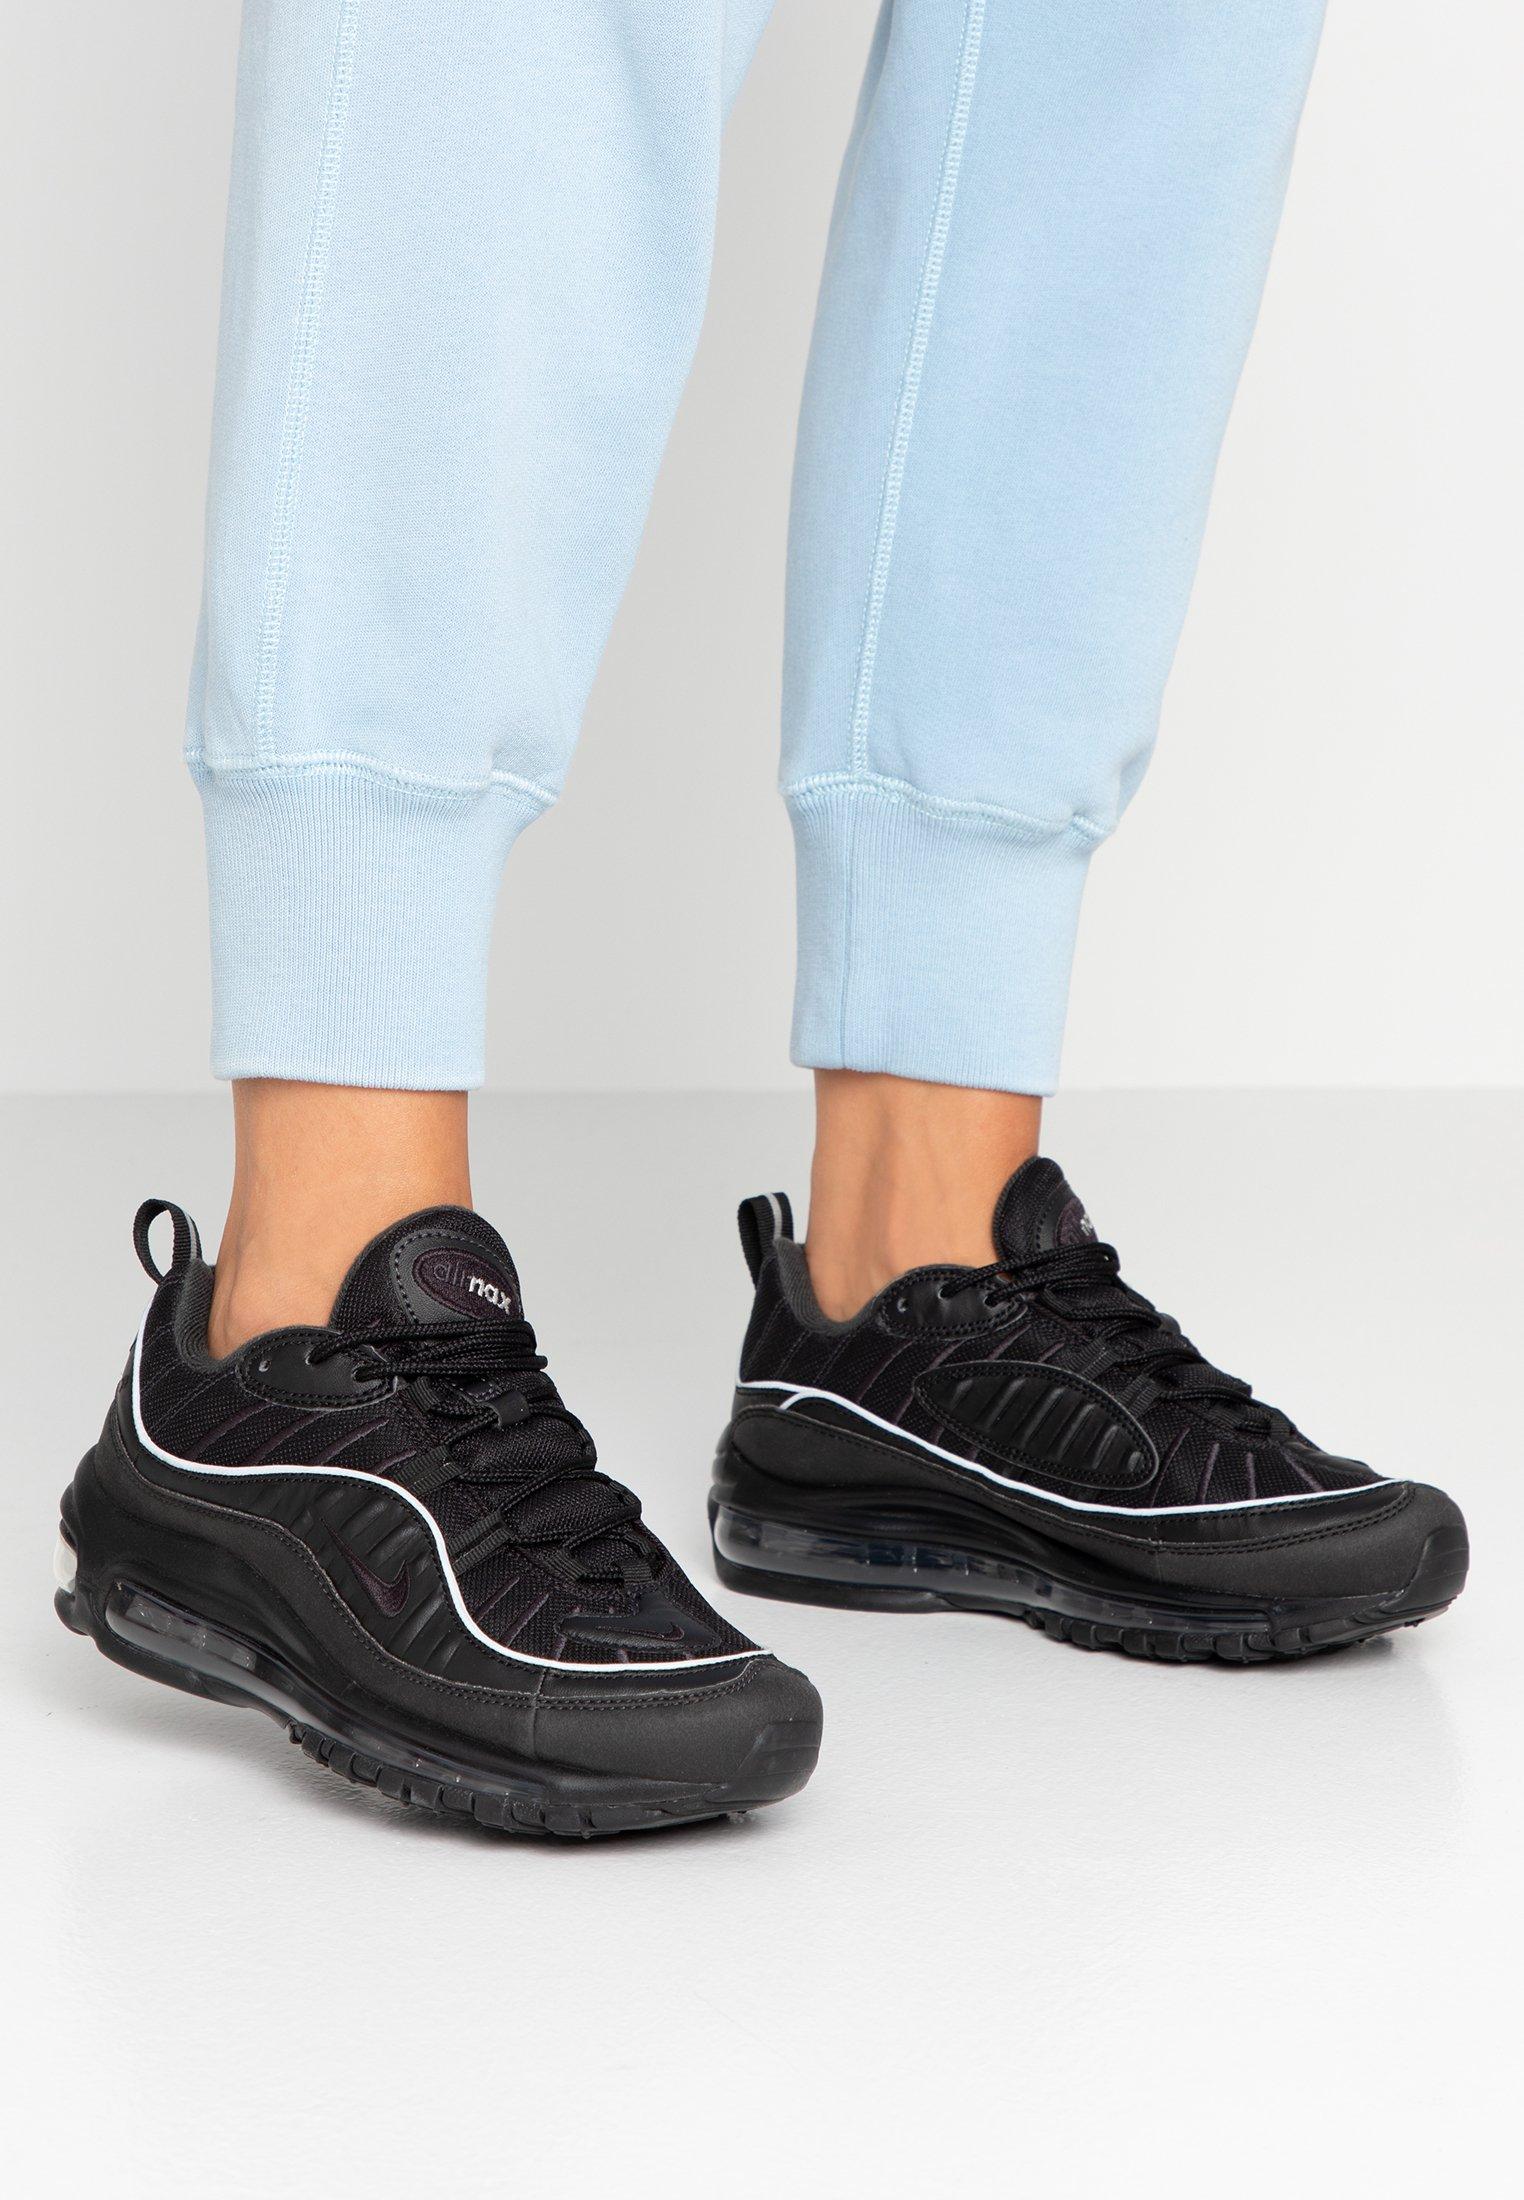 cooperar Será pesado  Nike Sportswear AIR MAX 98 - Trainers - black/off noir/black - Zalando.de